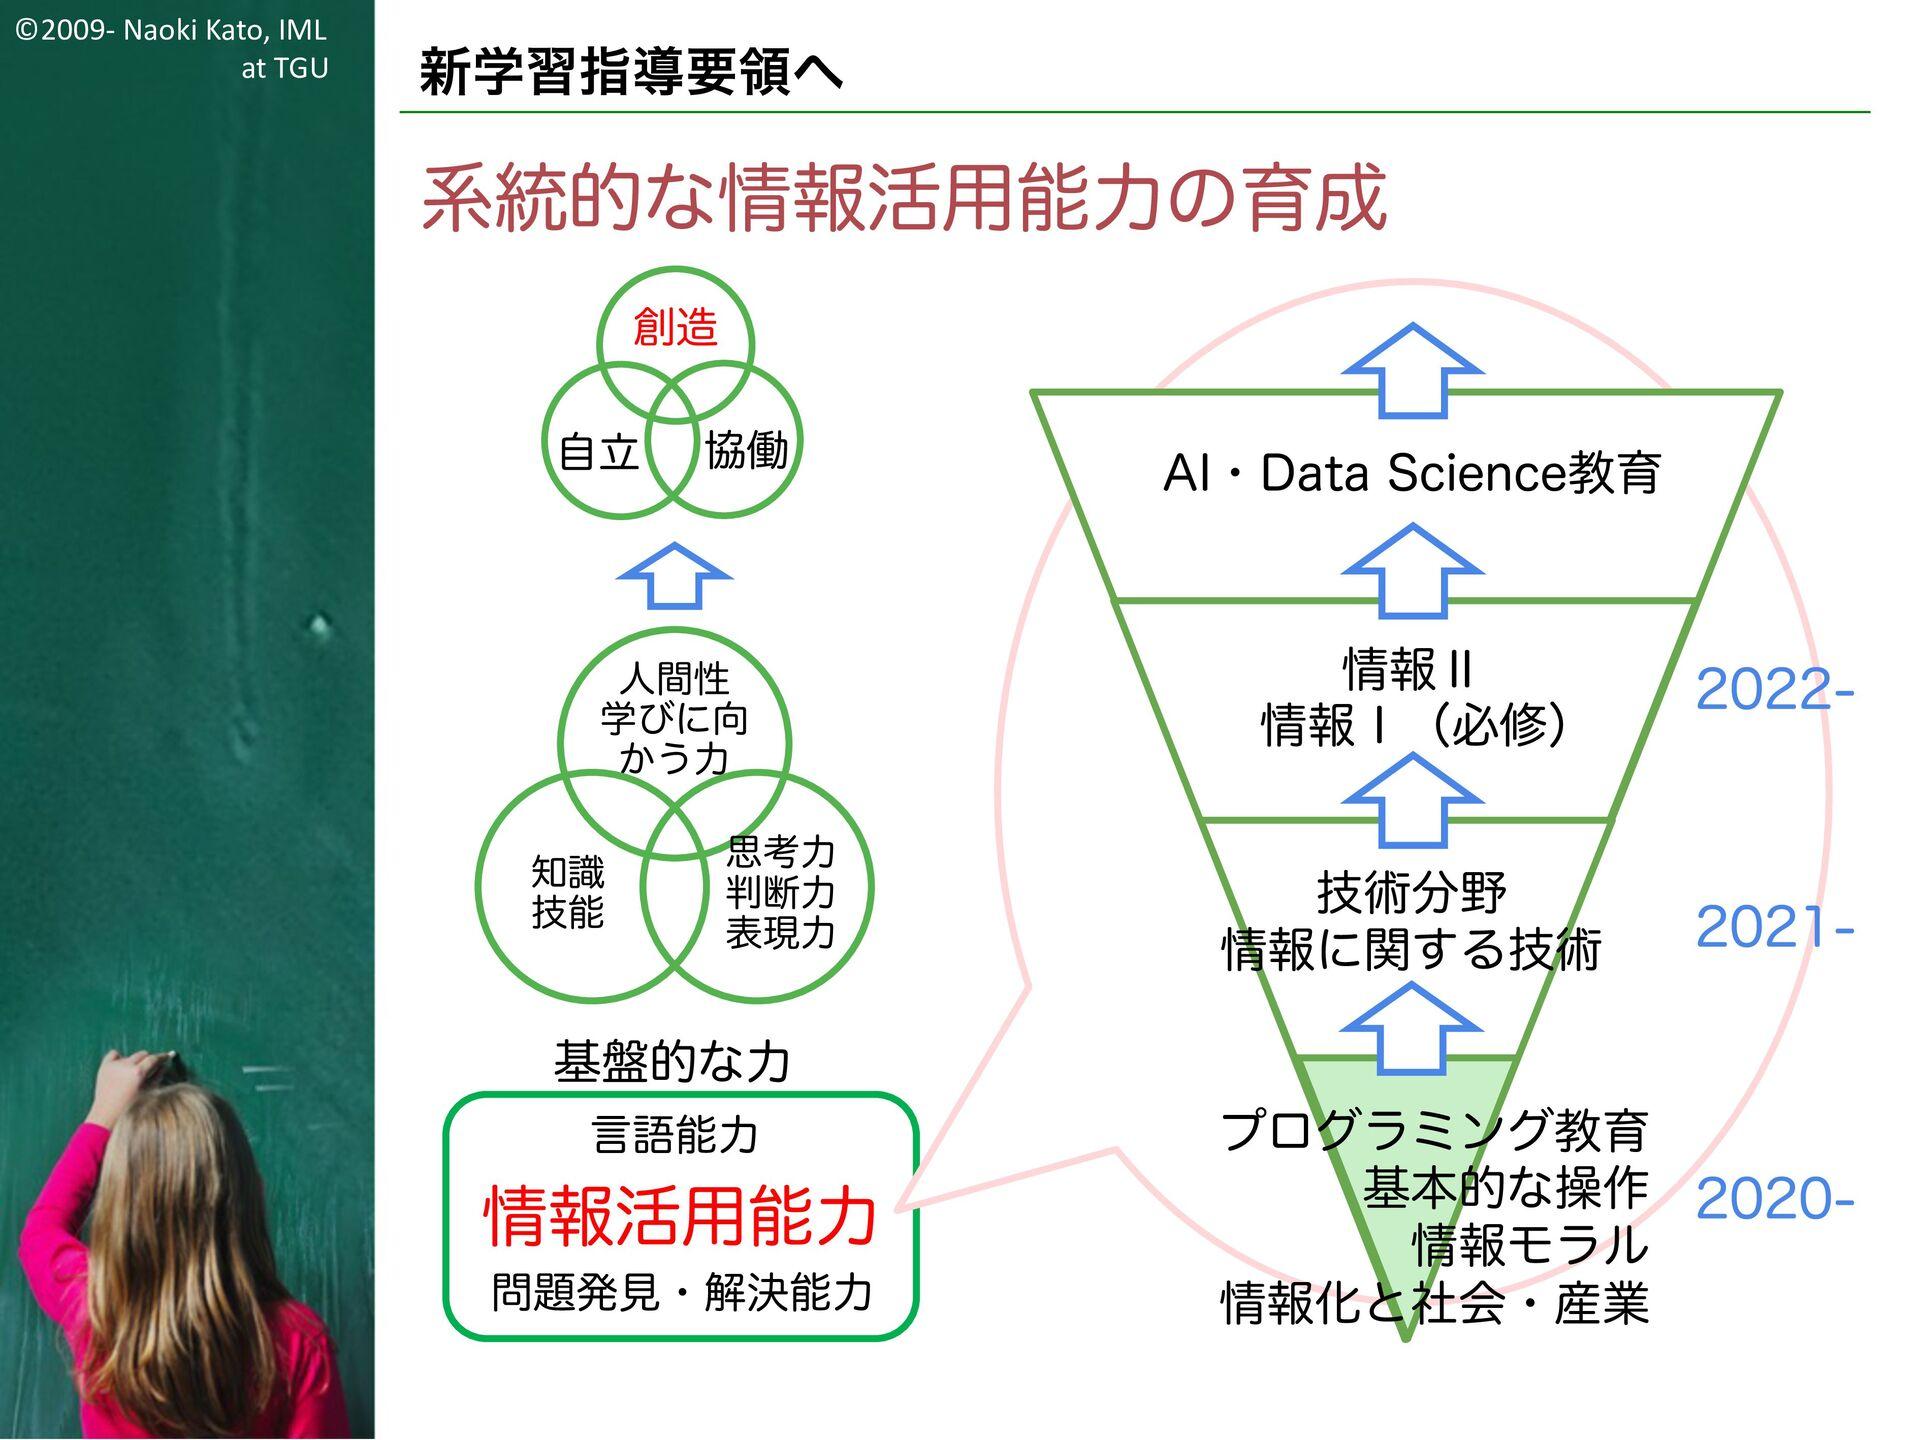 ©2009- Naoki Kato, IML at TGU 新学習指導要領へ 学習指導要領にお...